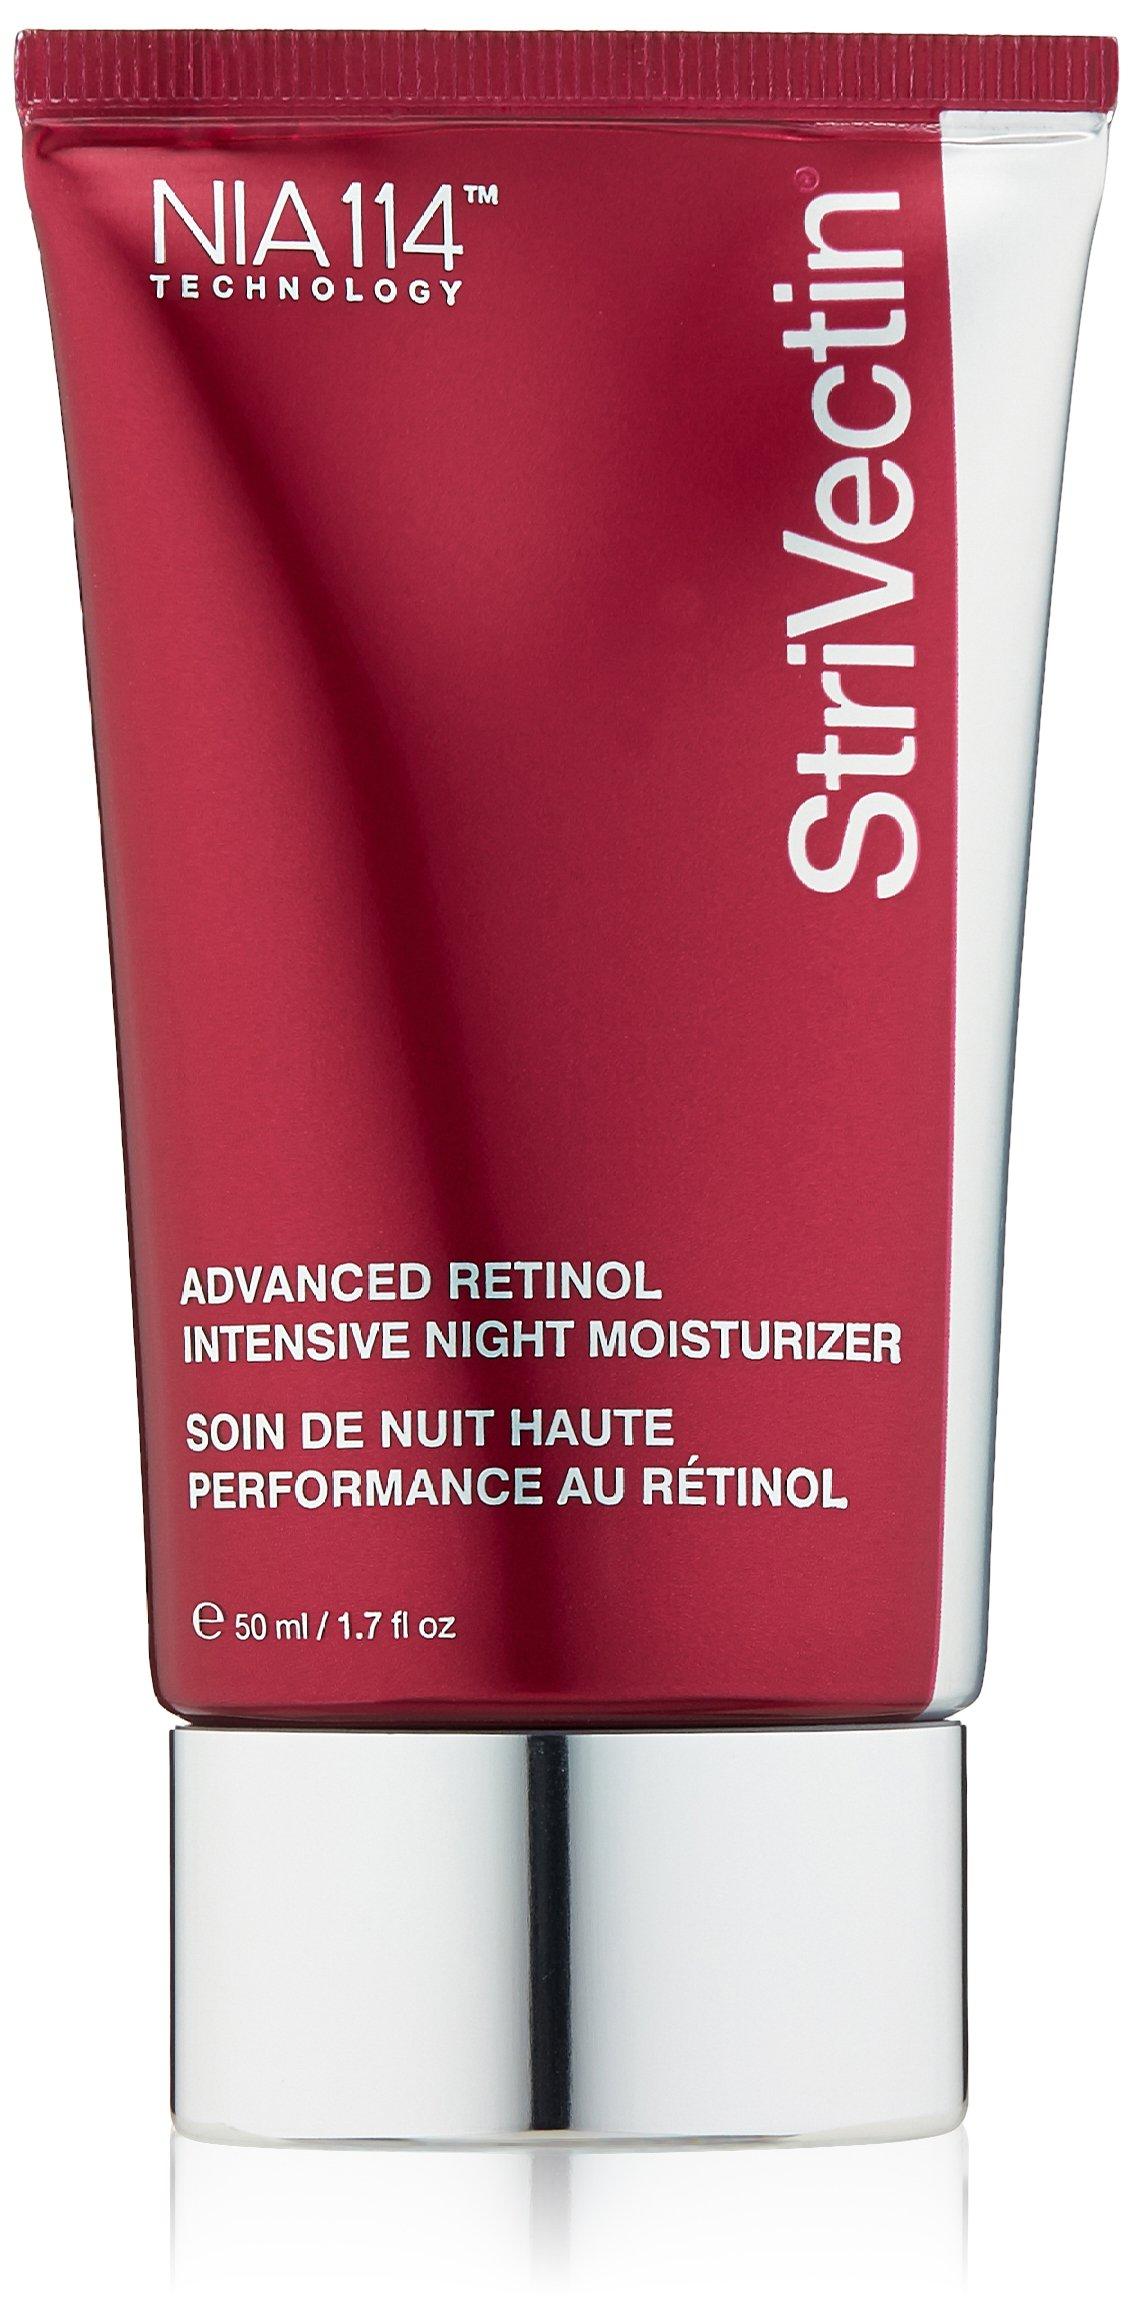 StriVectin Advanced Retinol Intensive Night Moisturizer, 1.7 oz.